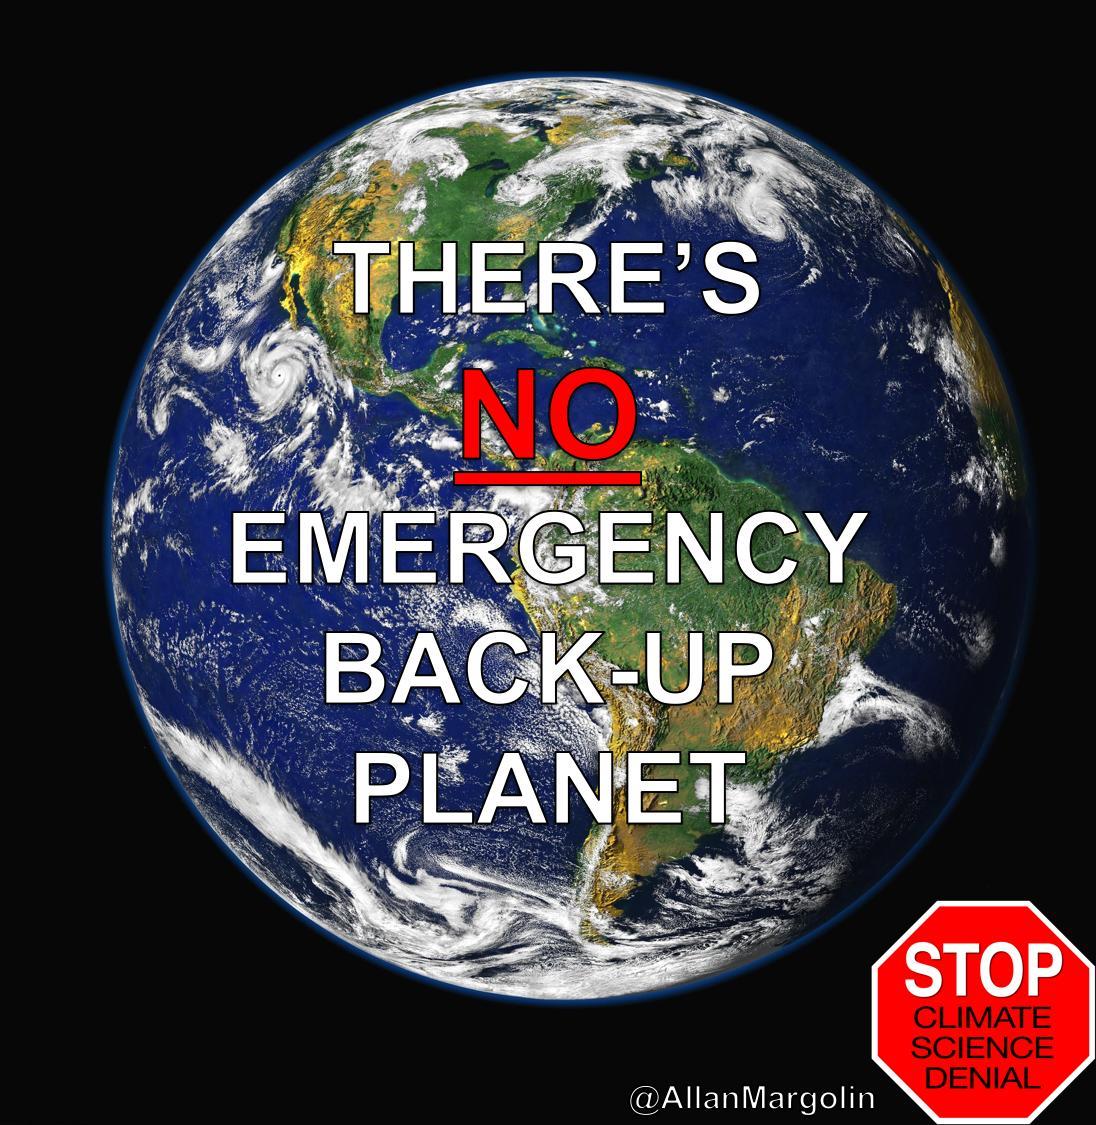 @PlaceboDingo @NBCNews @seth_leitman @itsJeffTiedrich @RareCat @CitizensFedUp @AWorldOutOfMind @awelab1956 @CorbieCrow @StillJohnCA @MClarissa @tamcdonald @wvjoe911 @Rose52413 @mpgarza2012 @TrinityResists 👊 Keep Up The #ClimateAction!